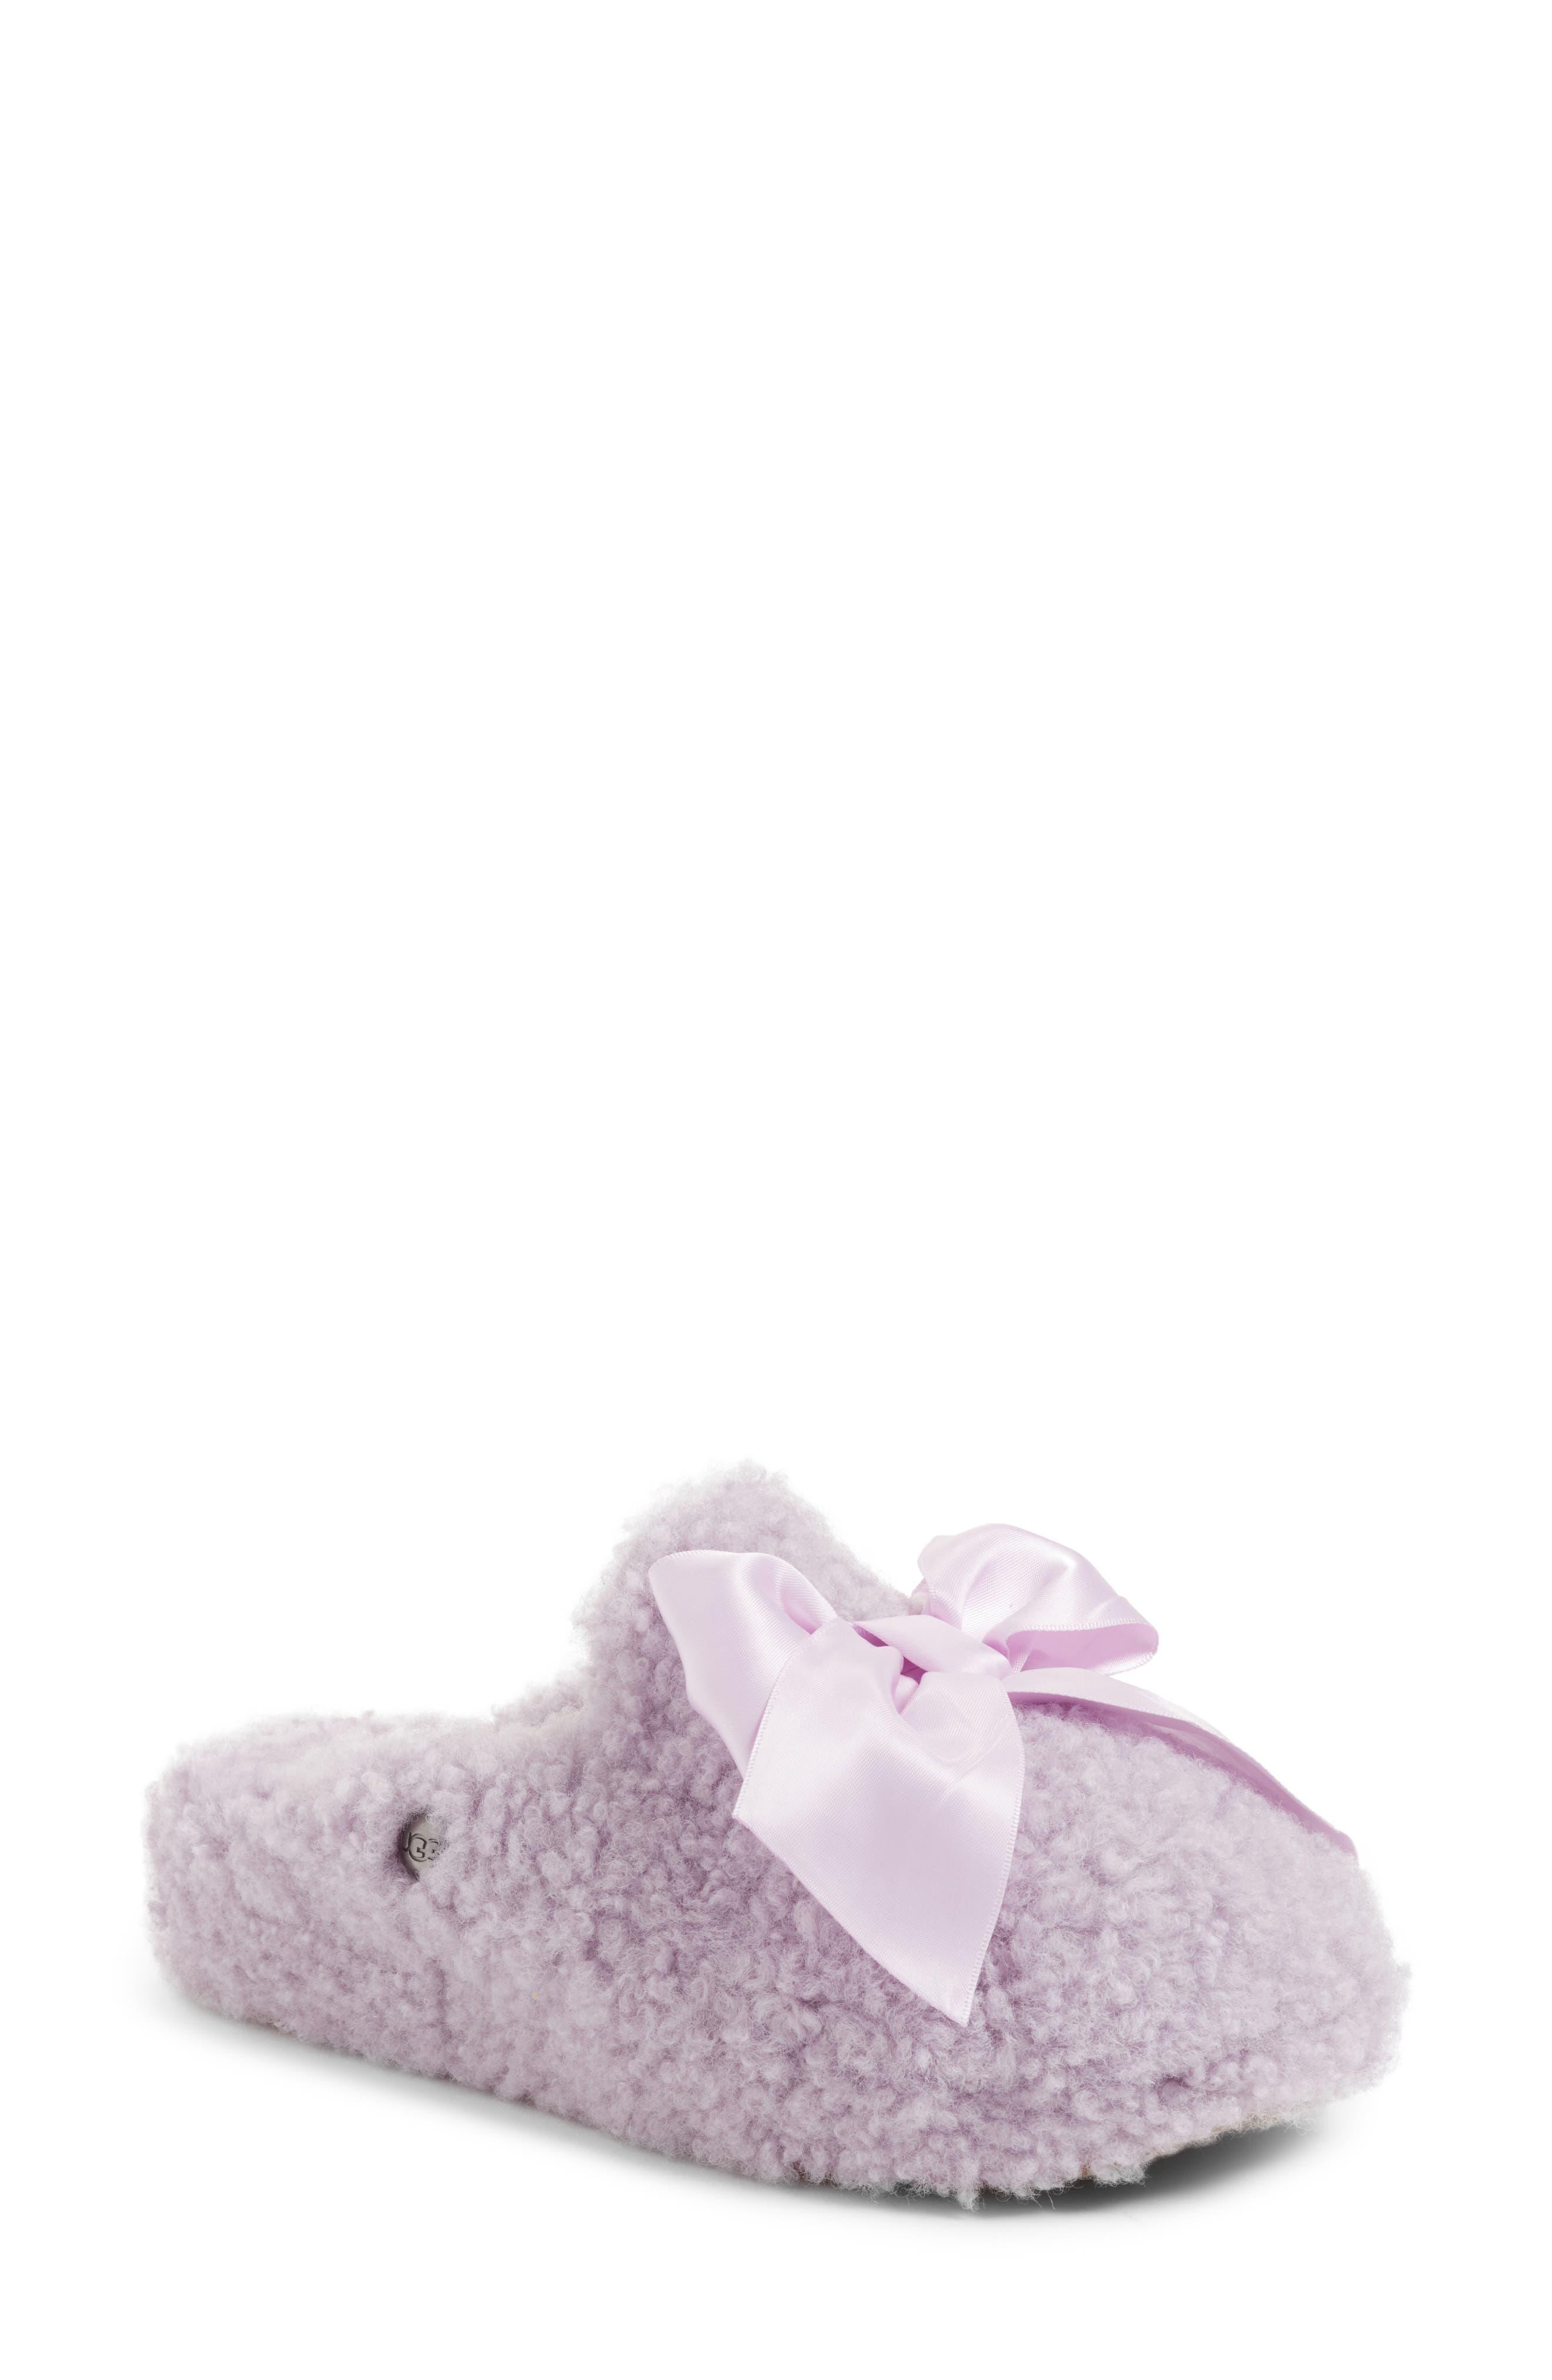 Addison Bow Slipper,                             Main thumbnail 1, color,                             Lavender Fog